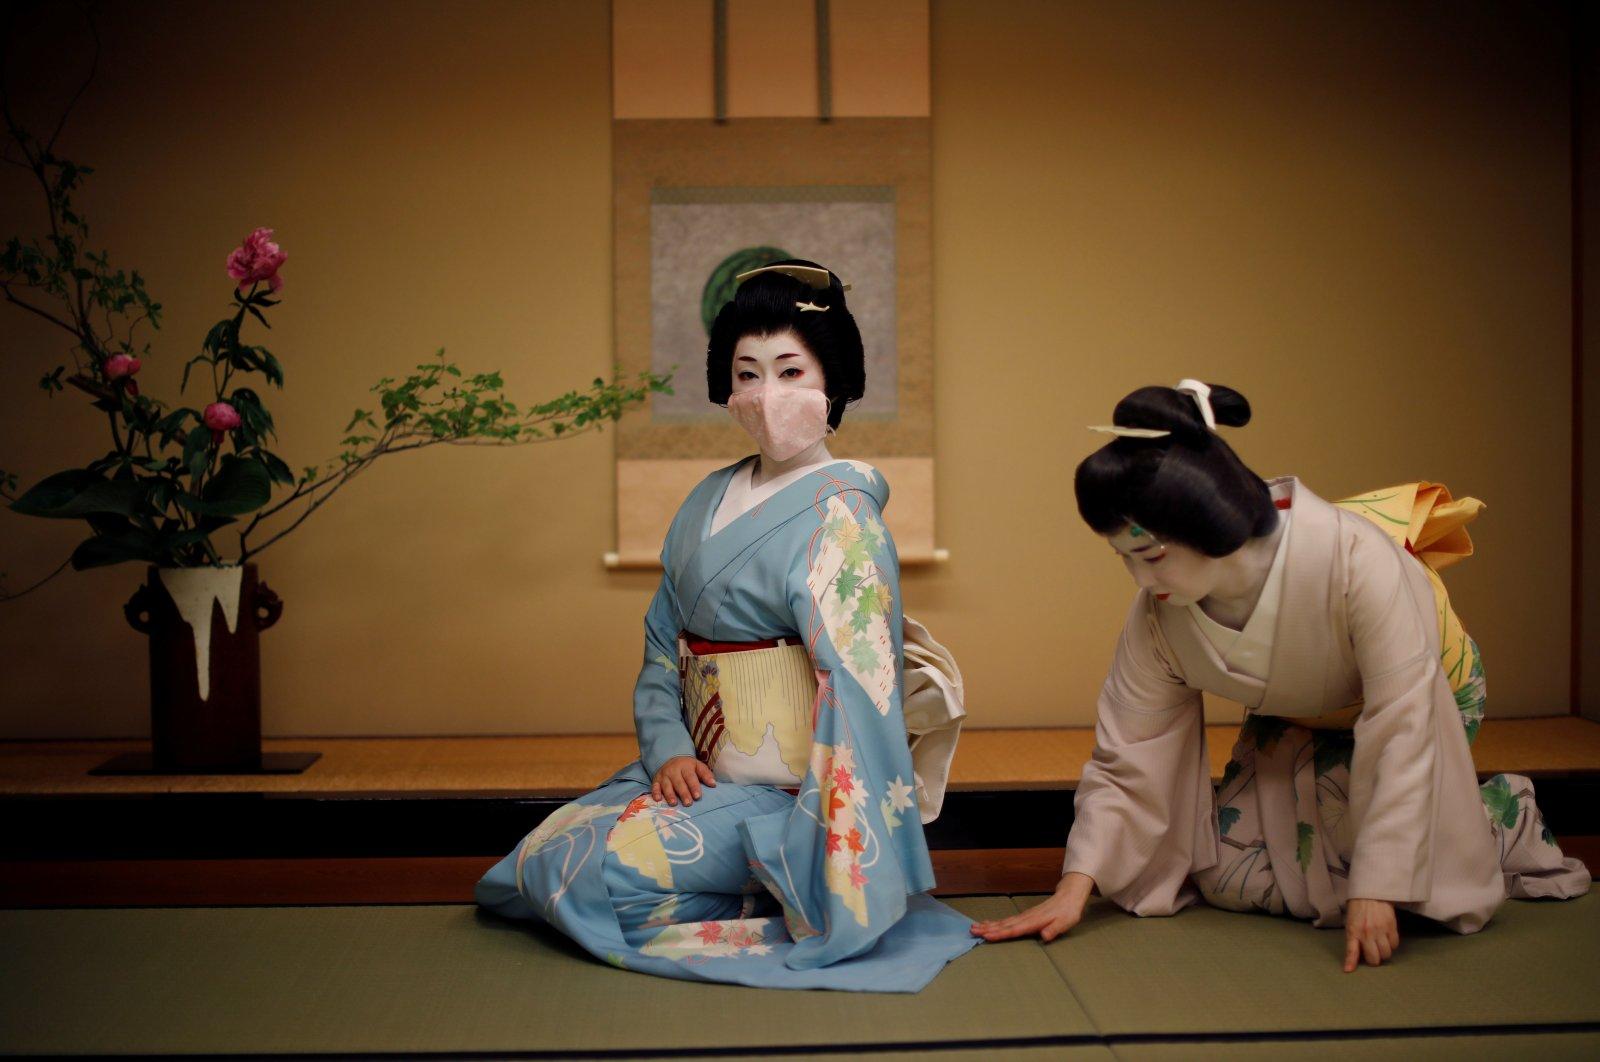 A photo of geisha women